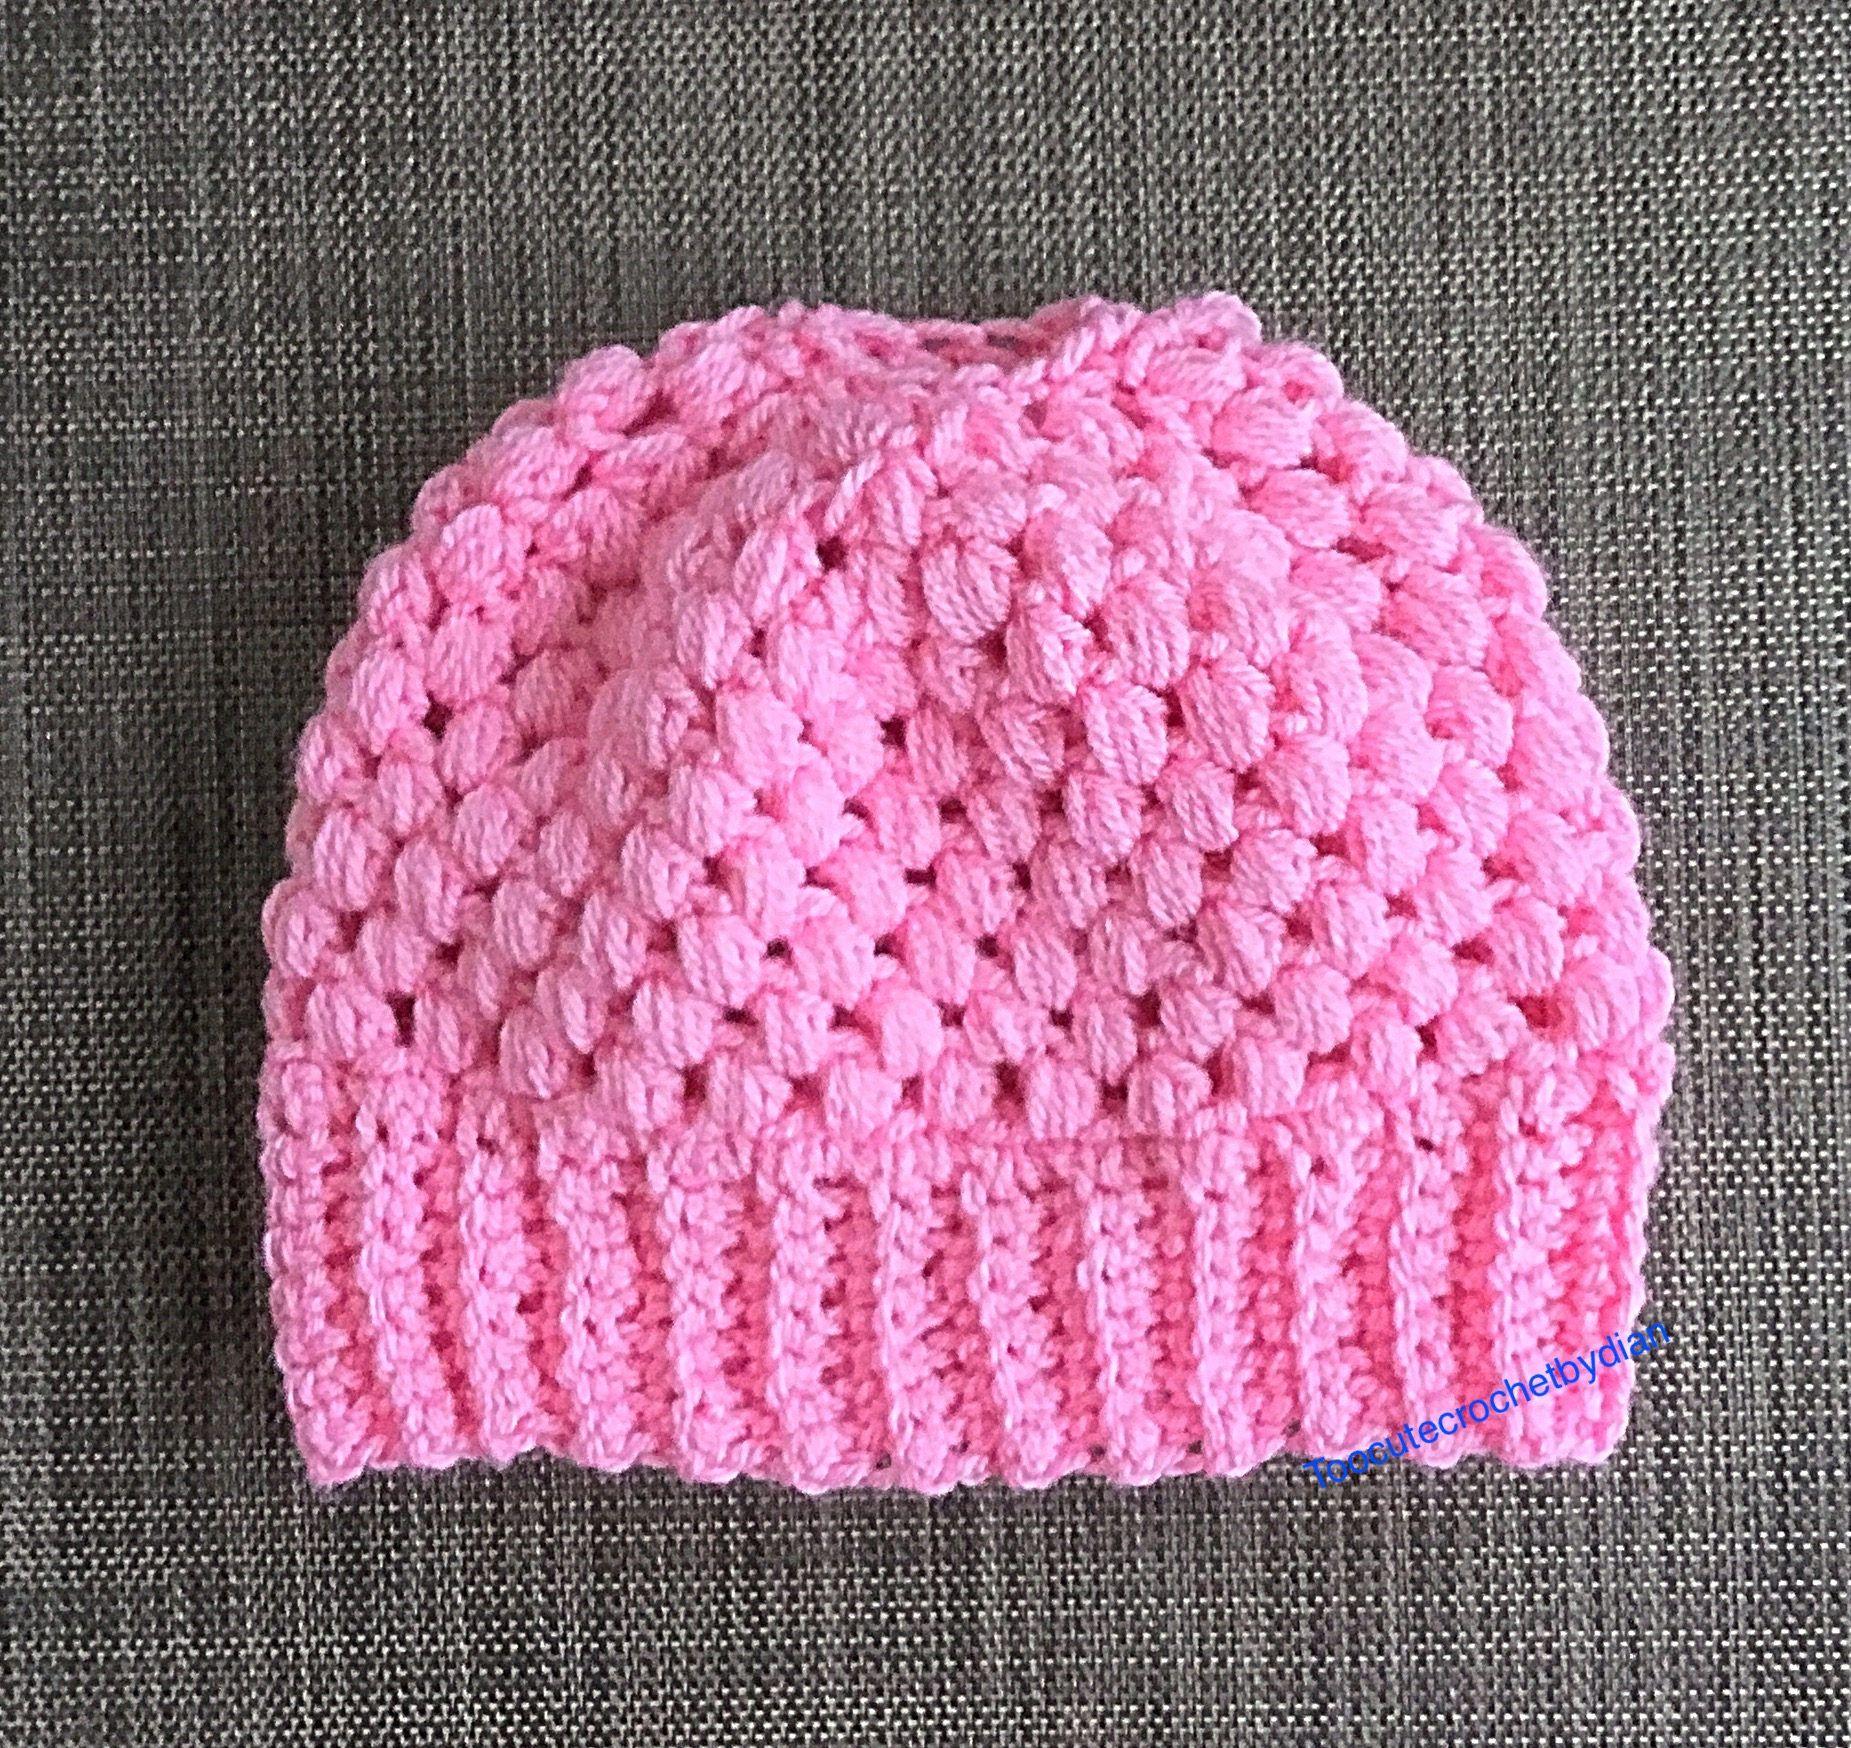 Crochet bun beanie, Mom bun beanie, ponytail hat, crochet messy bun ...